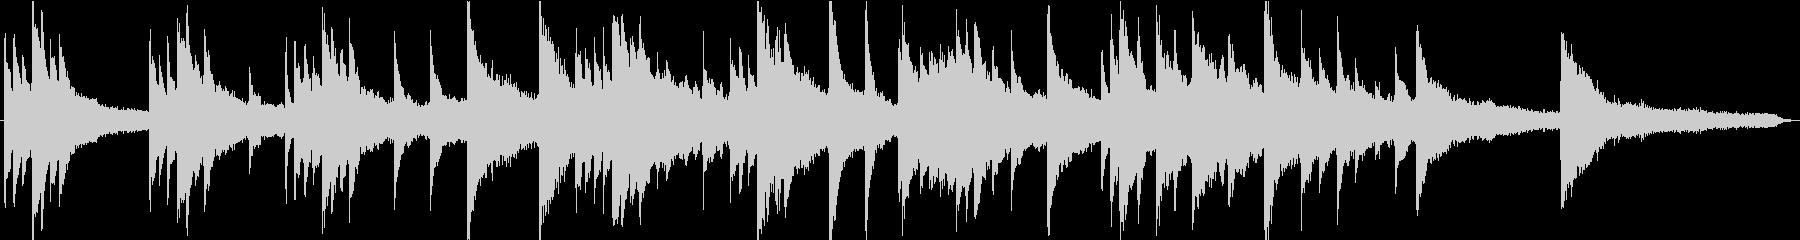 CM・企業VP用、59秒のピアノ楽曲の未再生の波形